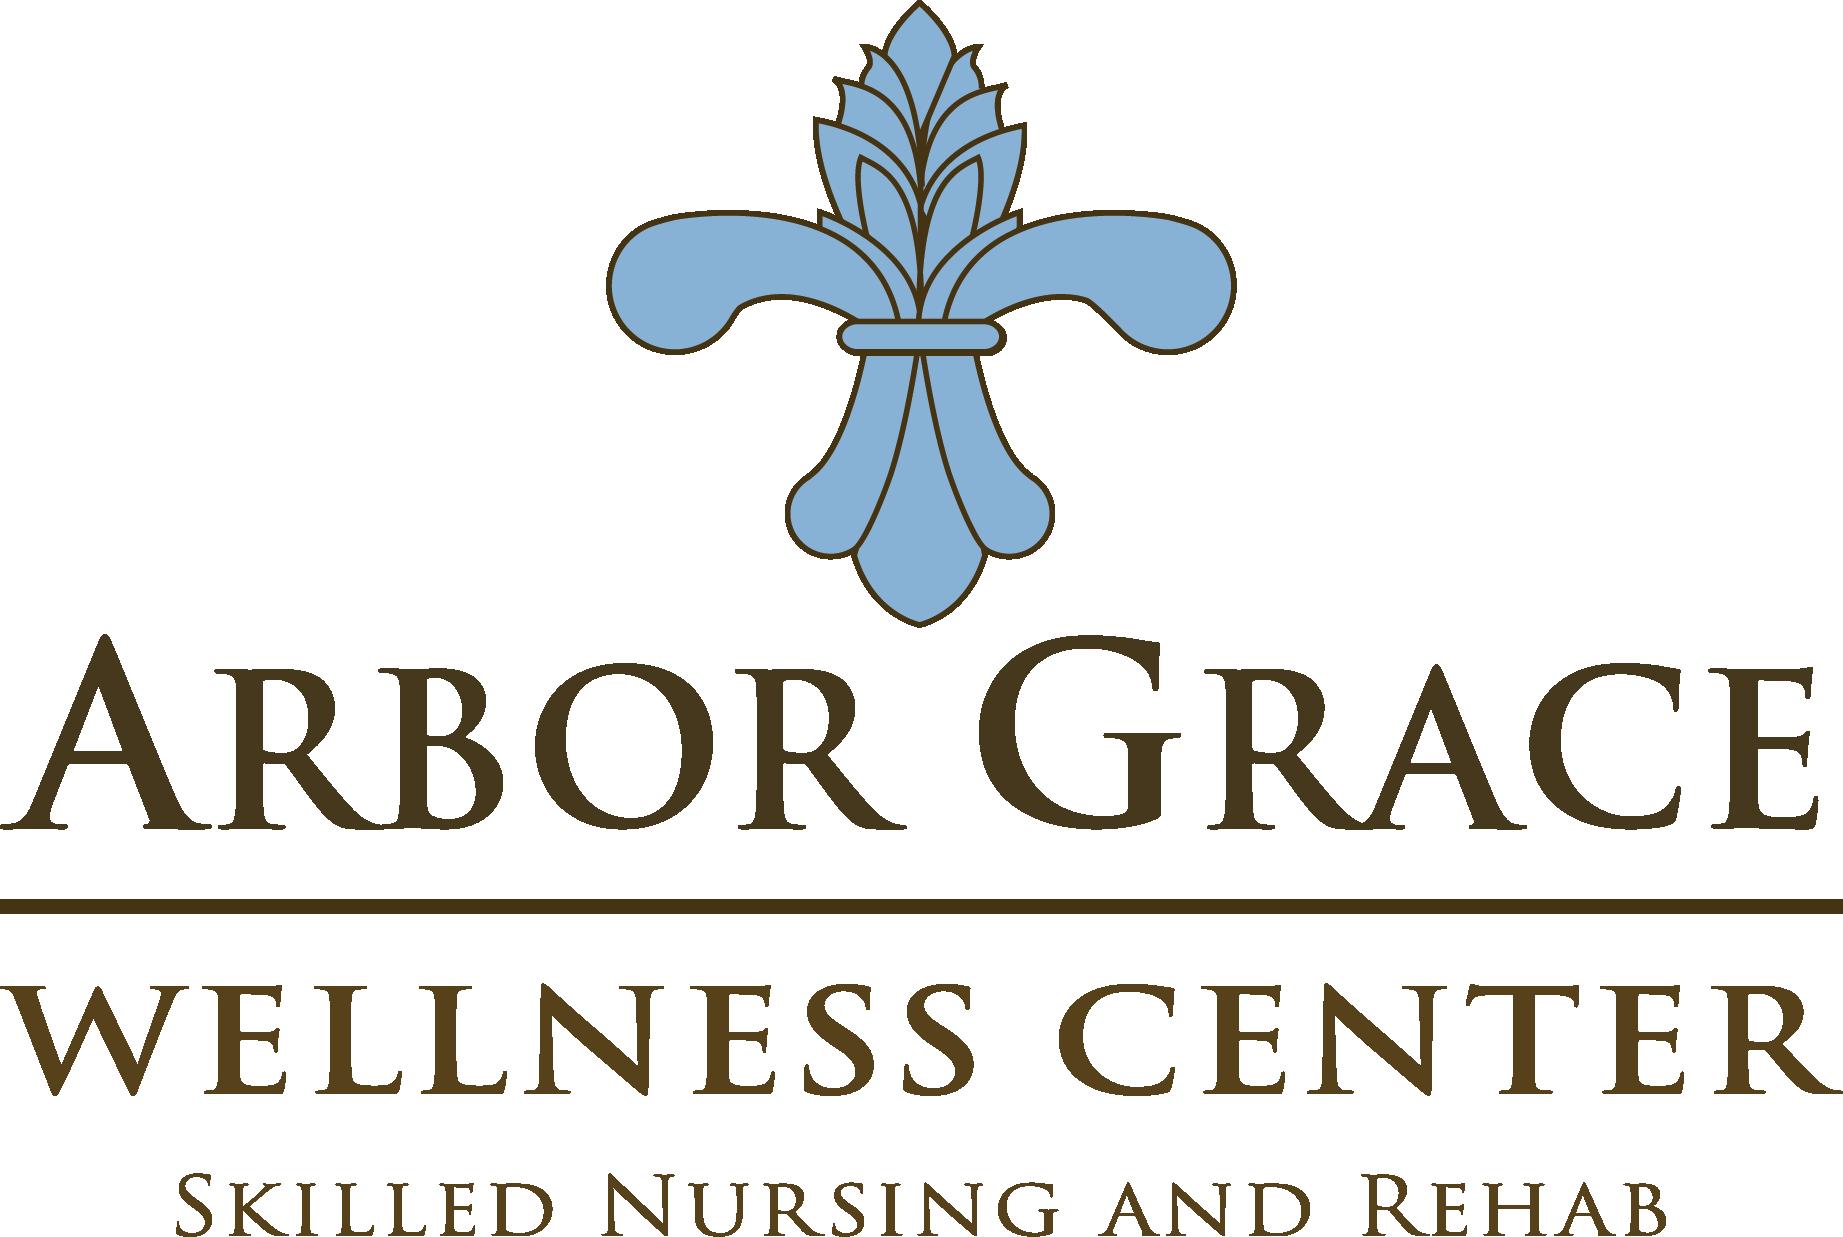 ArborGrace_WC_centered